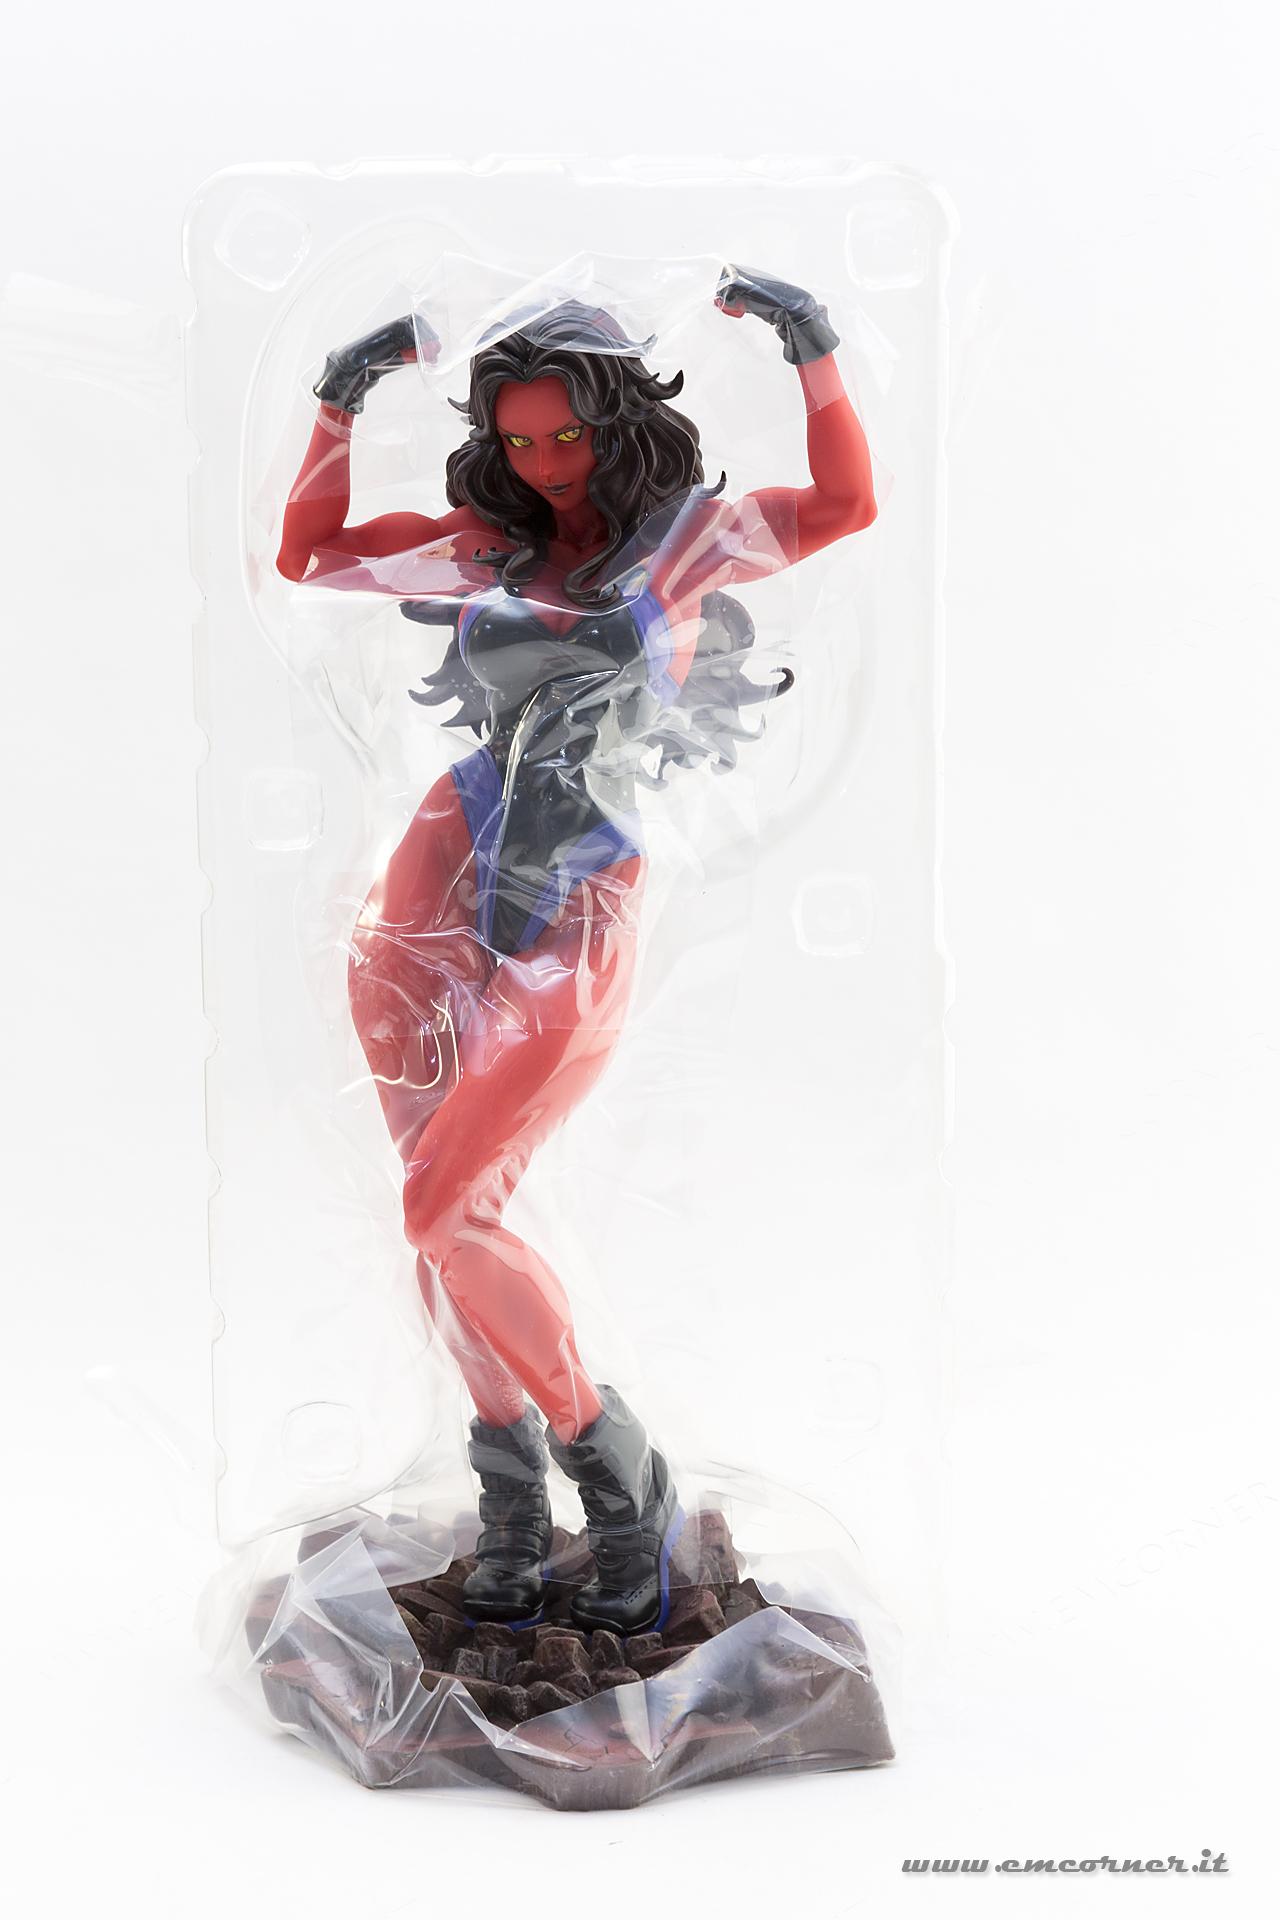 red_she_hul_kotobukiya_bishoujo_emcorner-it_-3